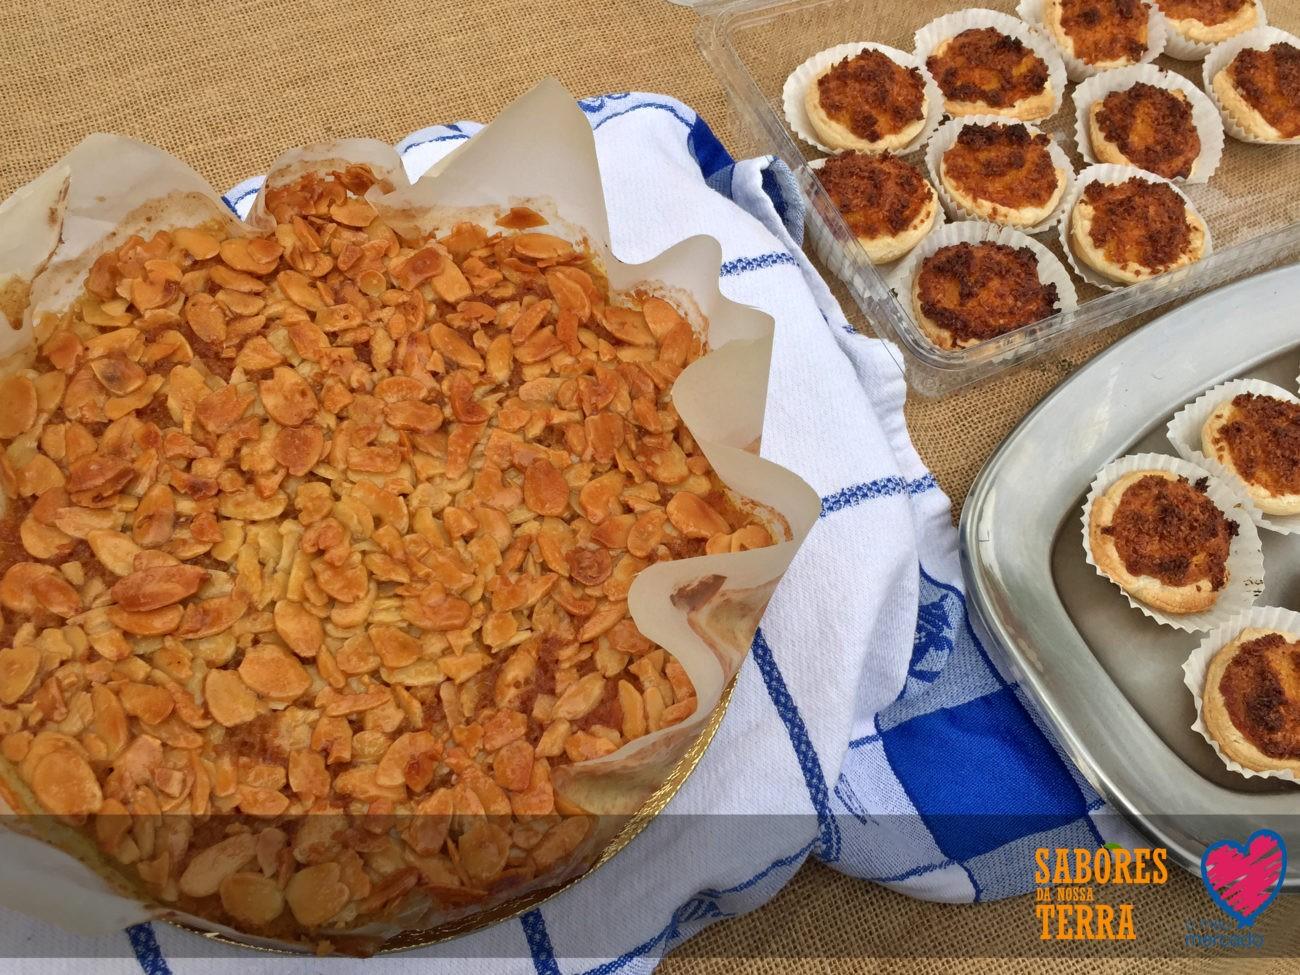 AMARES - Mercado tradicional de produtos locais voltou este sábado a Amares